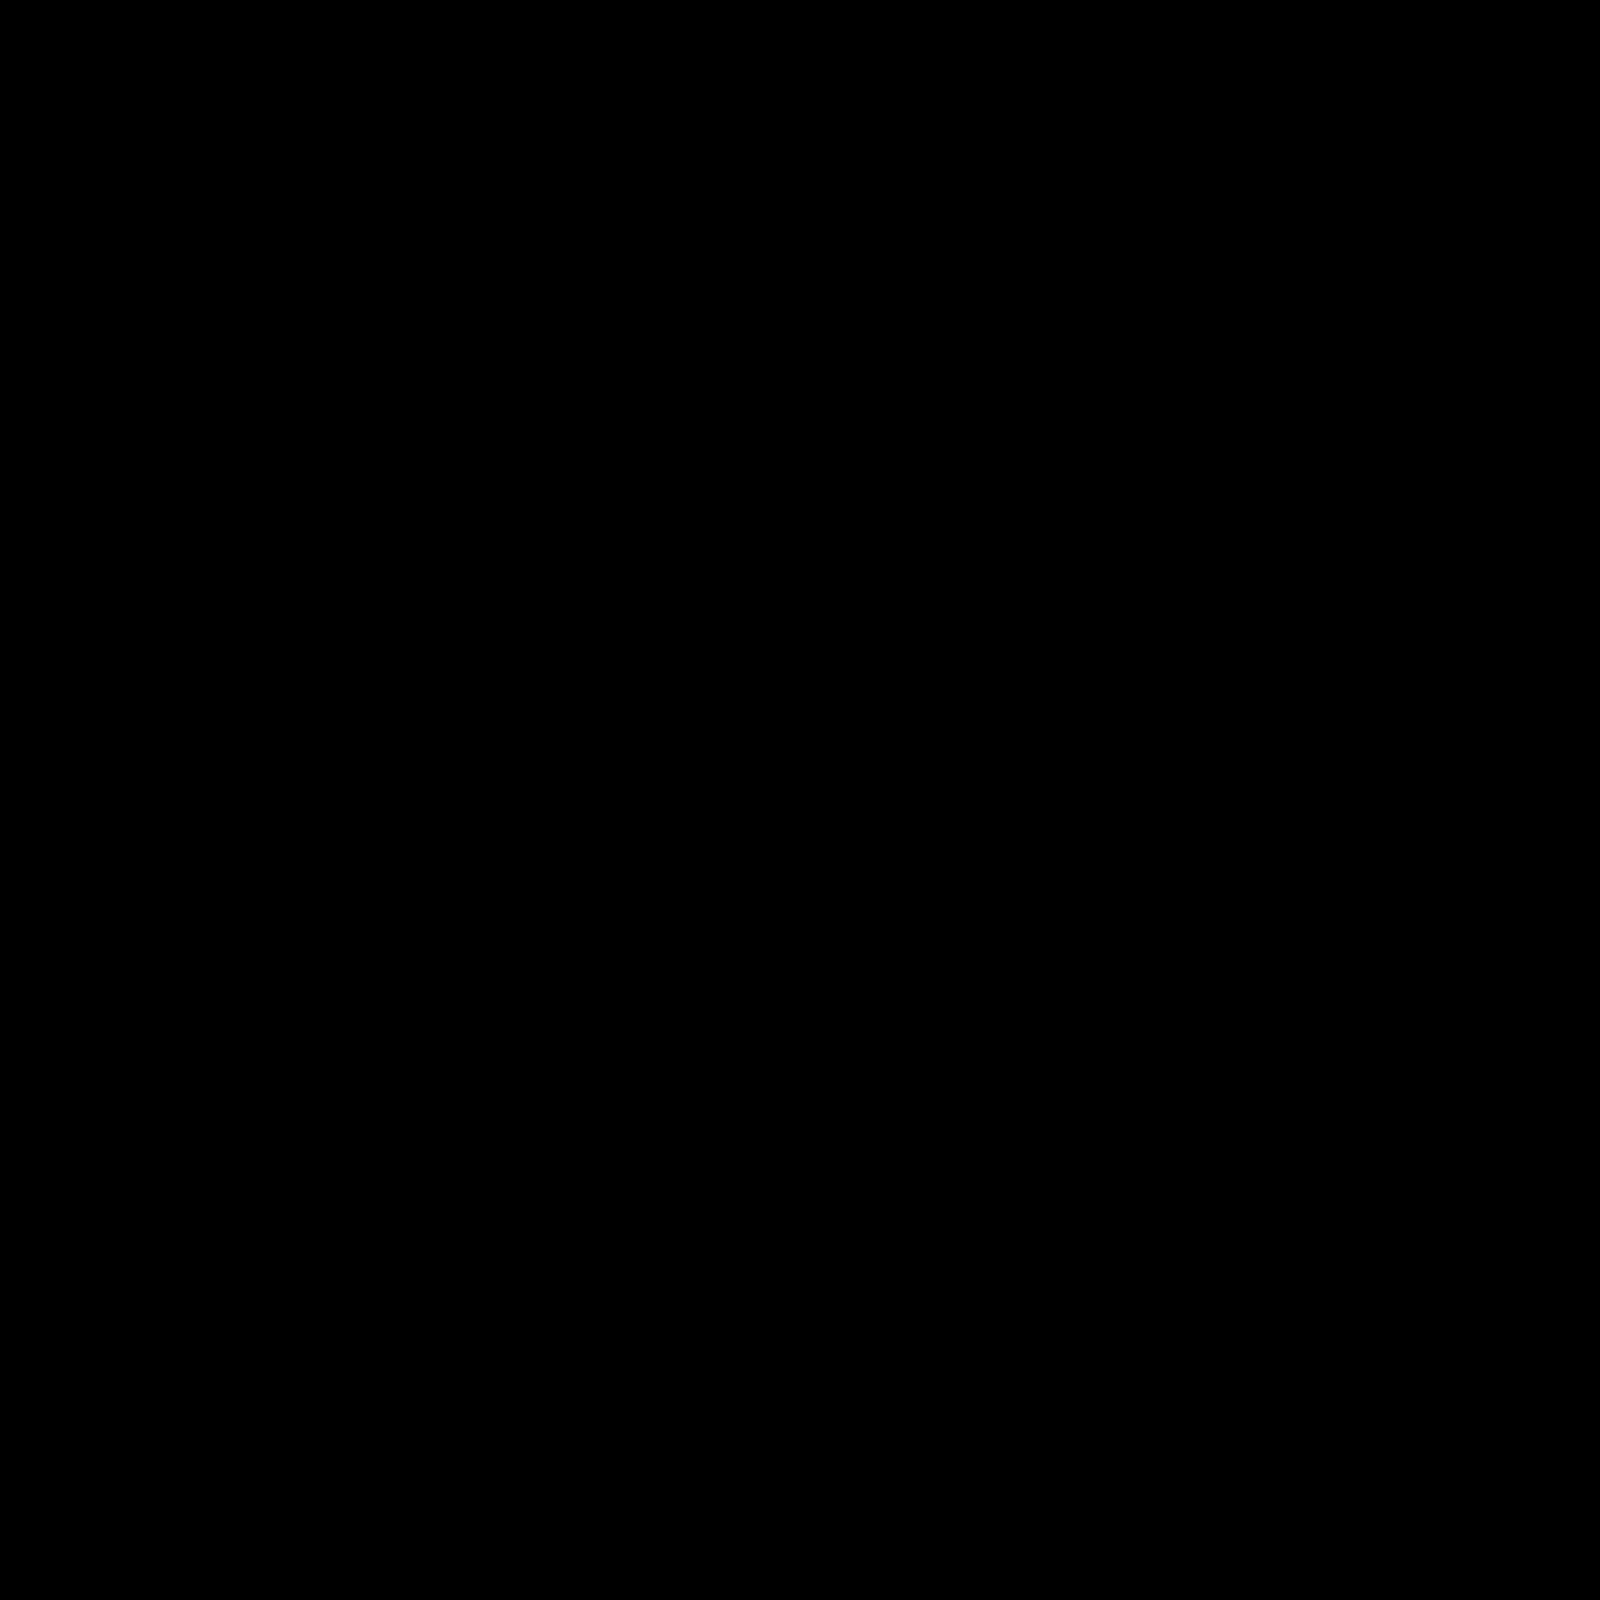 Headache Filled icon